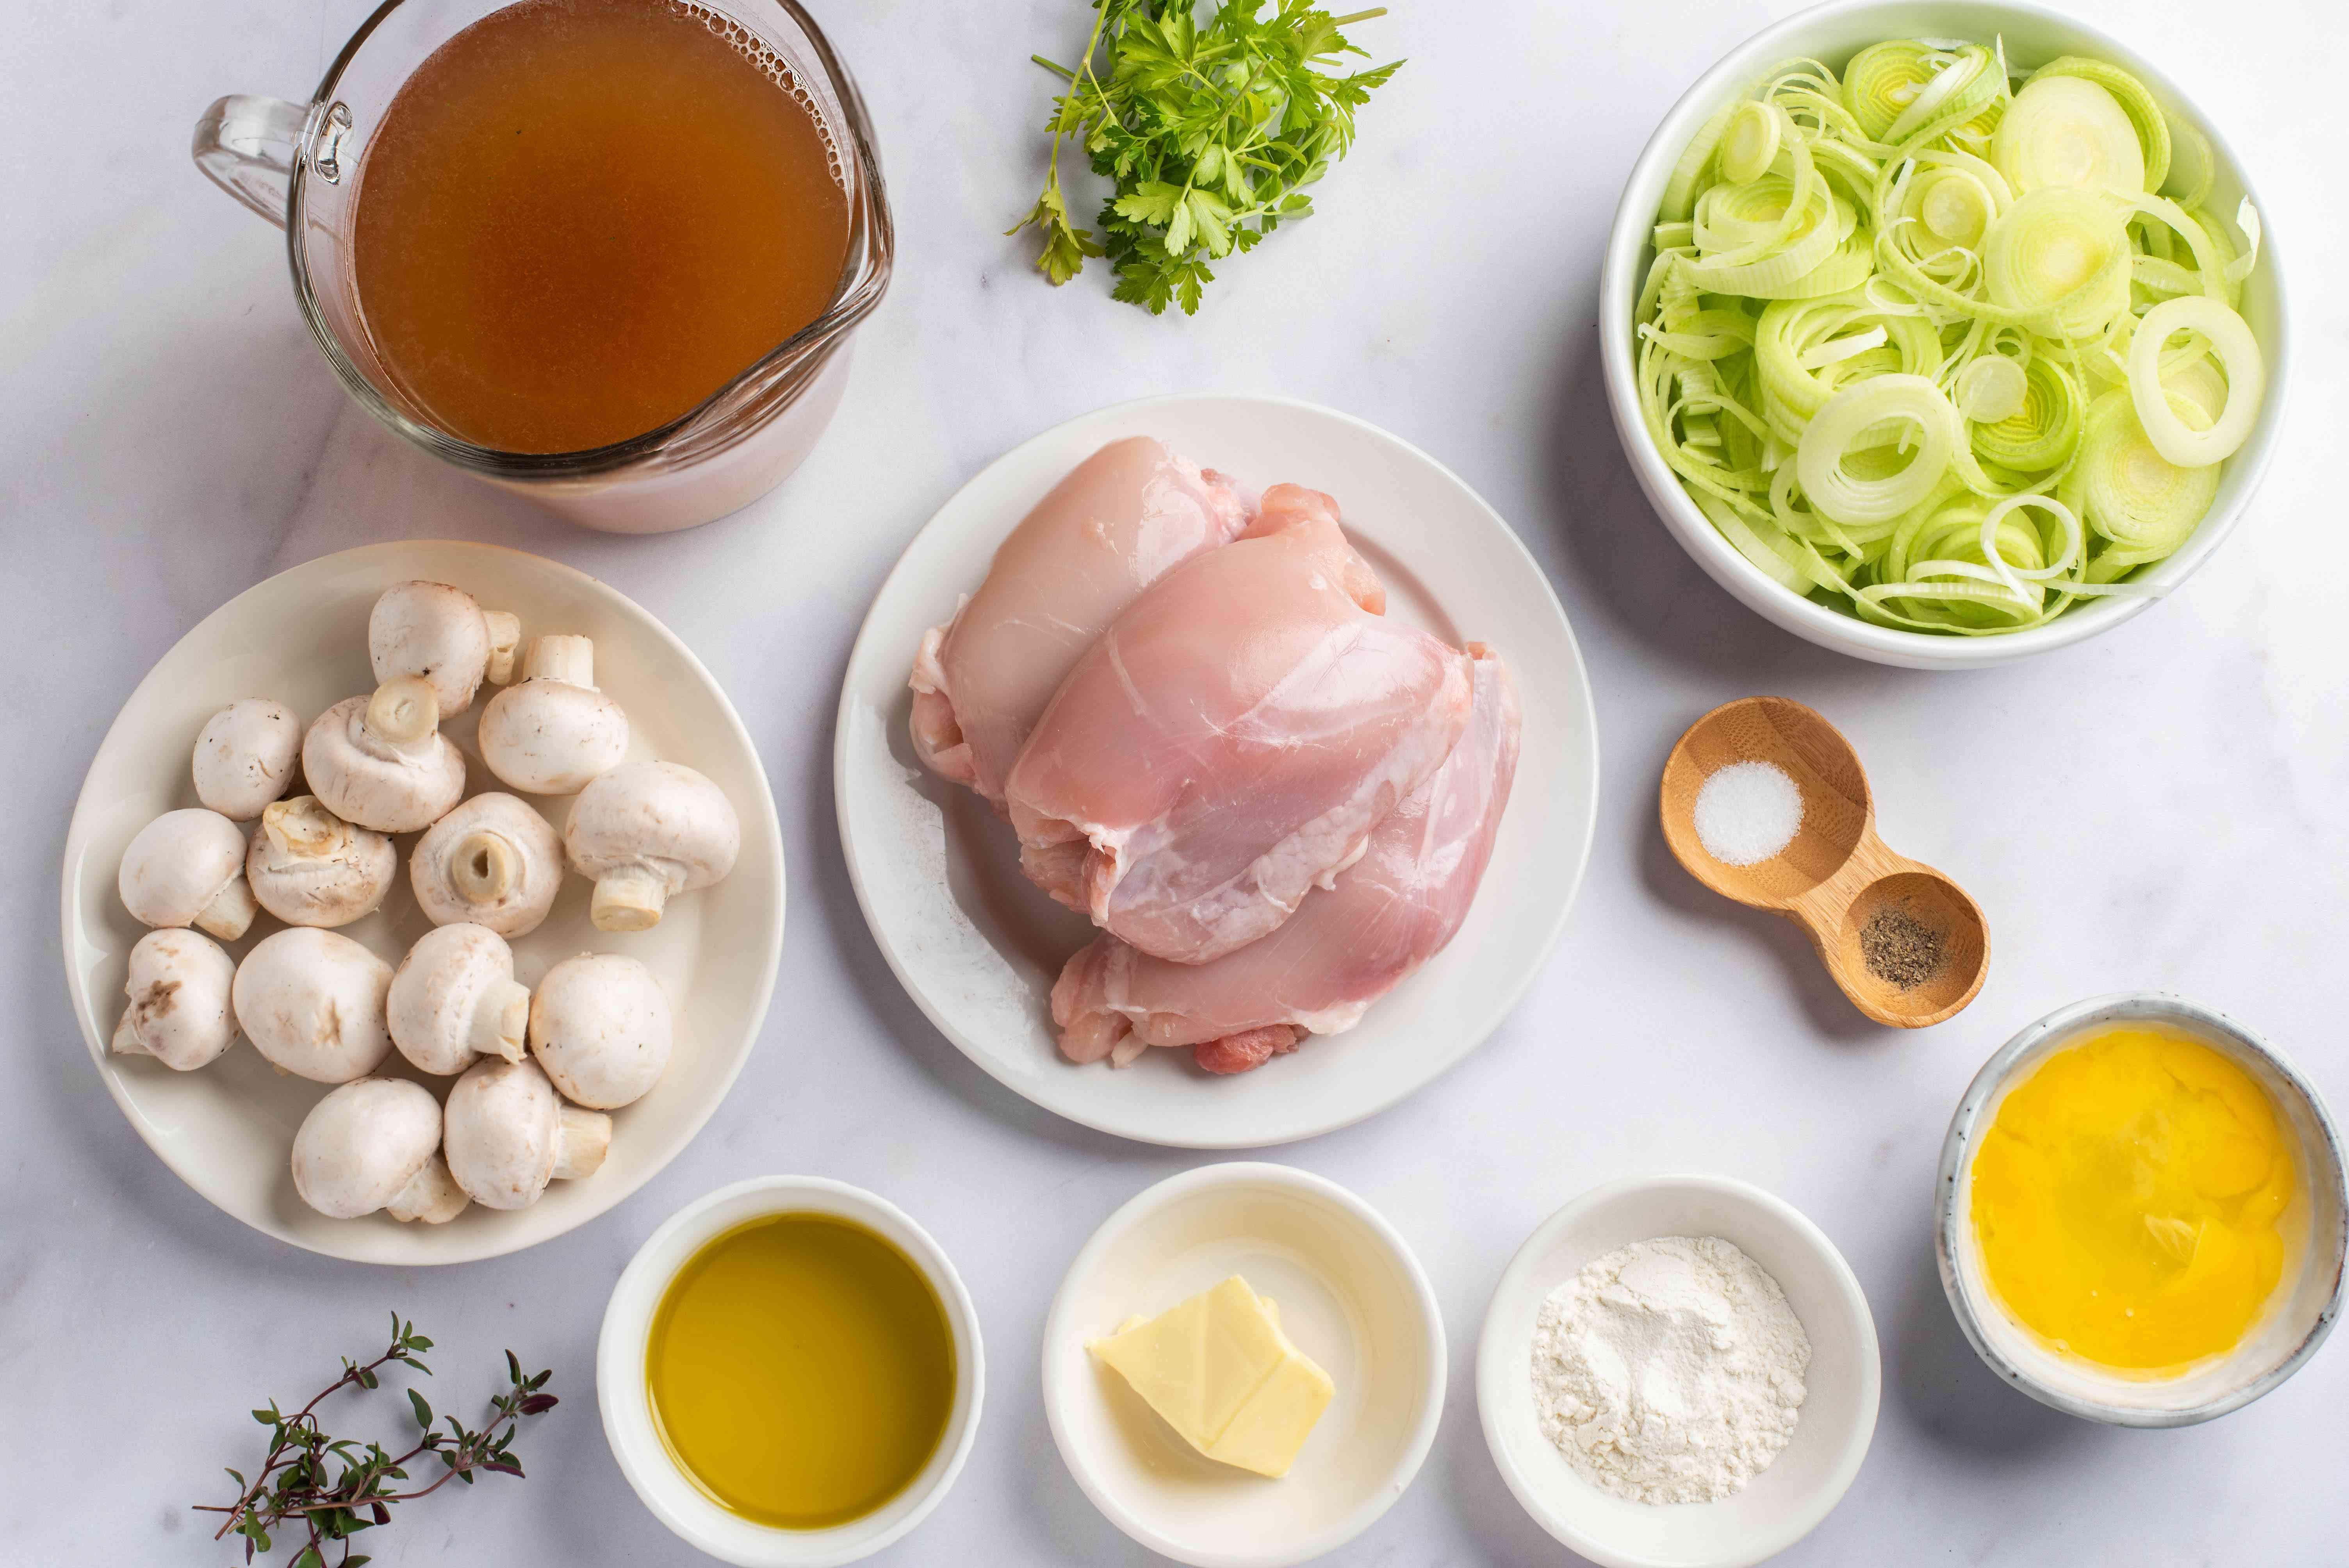 Ingredients for creamy mushroom chicken leek pie